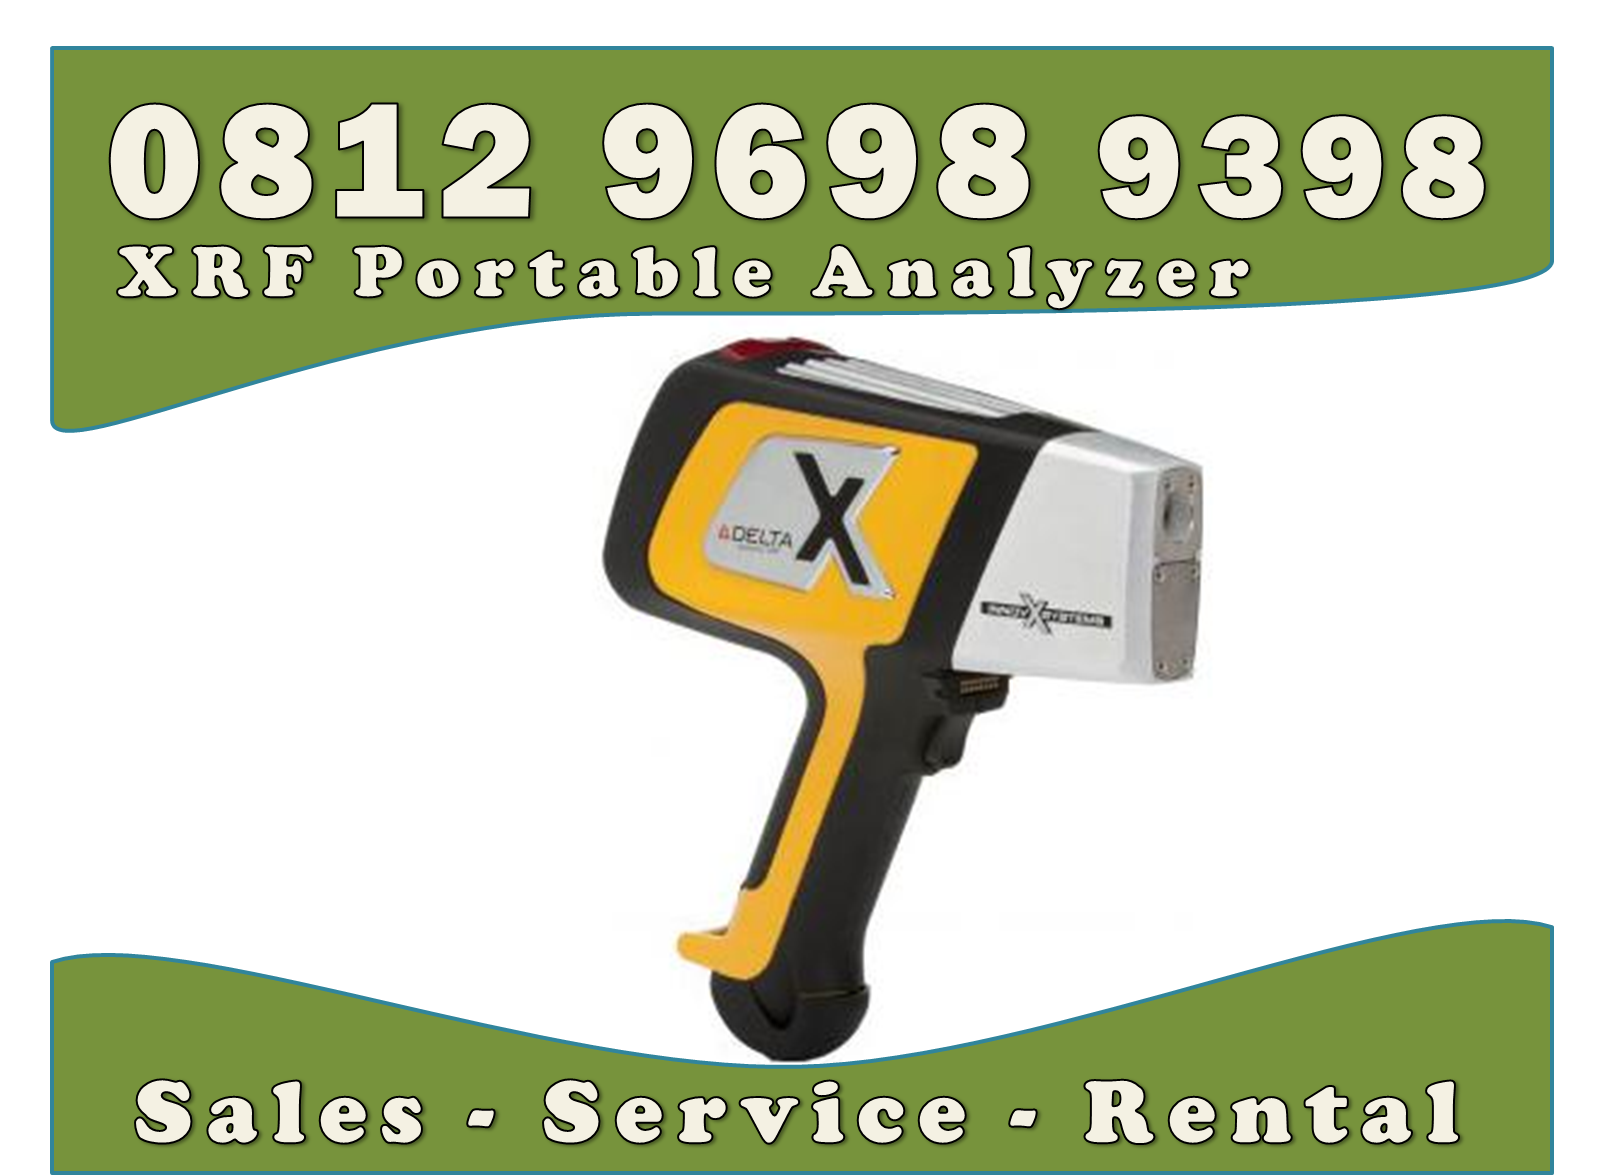 Pin Di Portable Countertop Goldxpert Xrf Analyzer